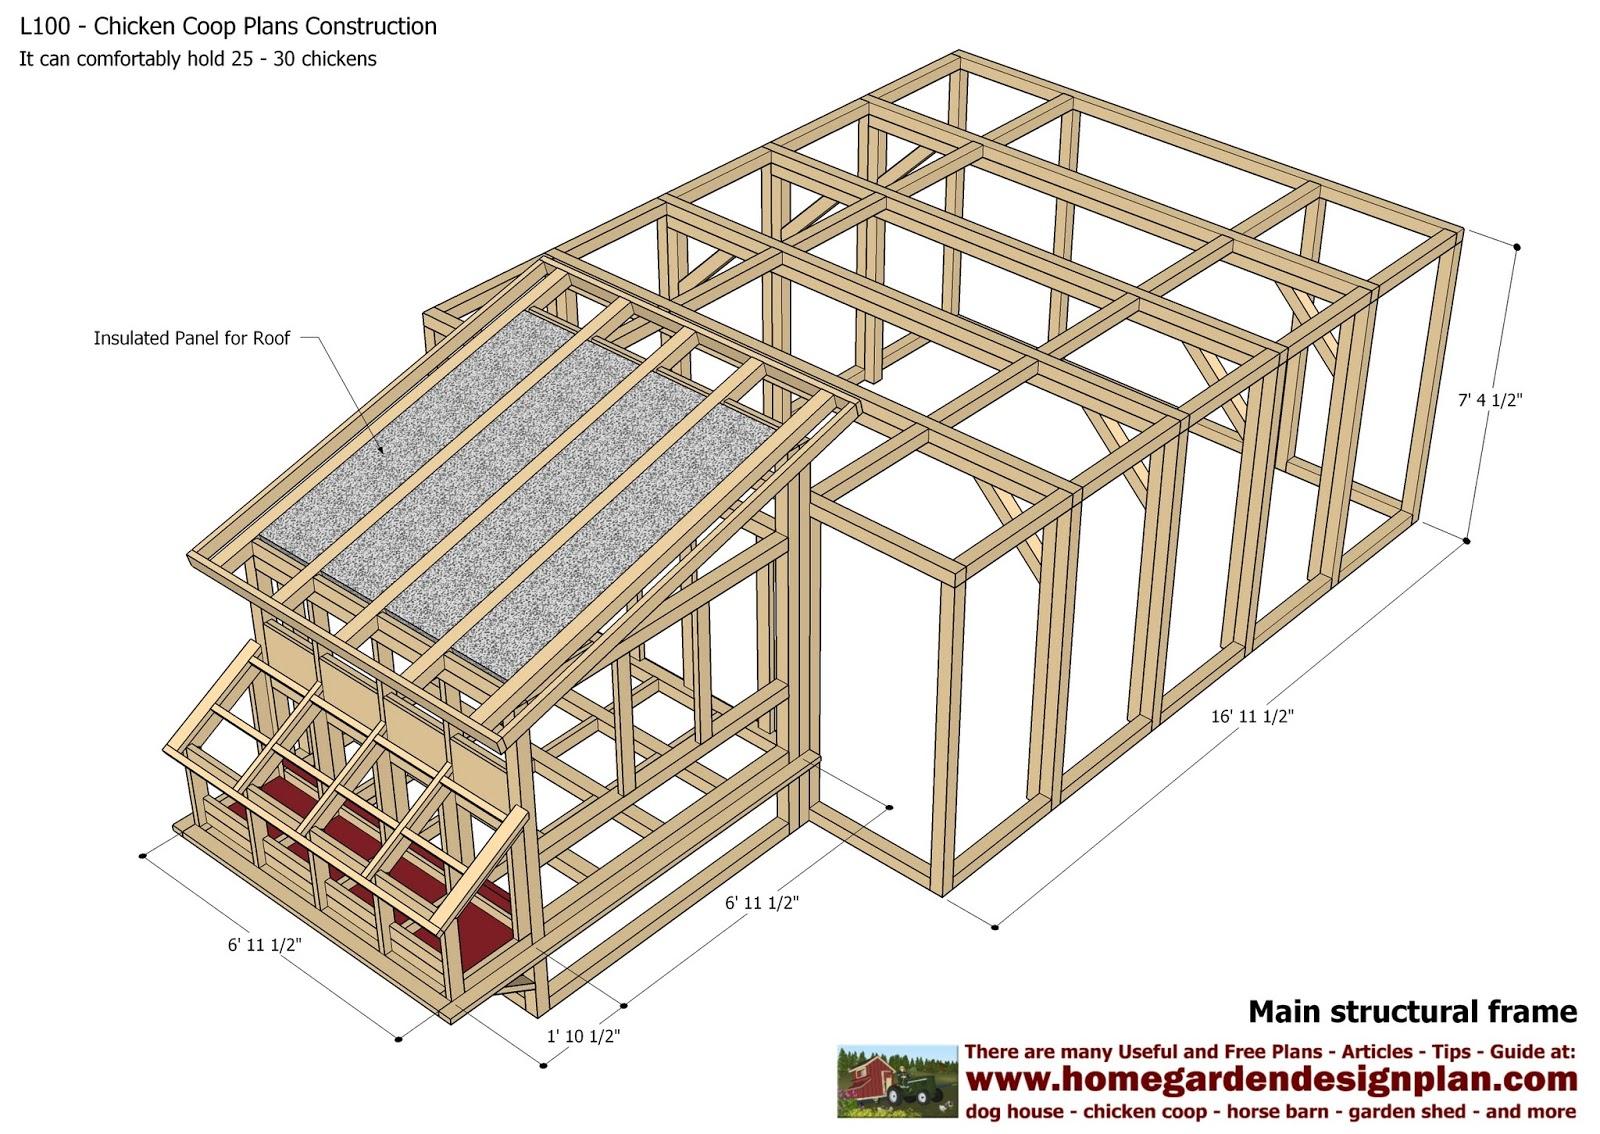 home garden plans: L100 - Chicken Coop Plans Construction ...